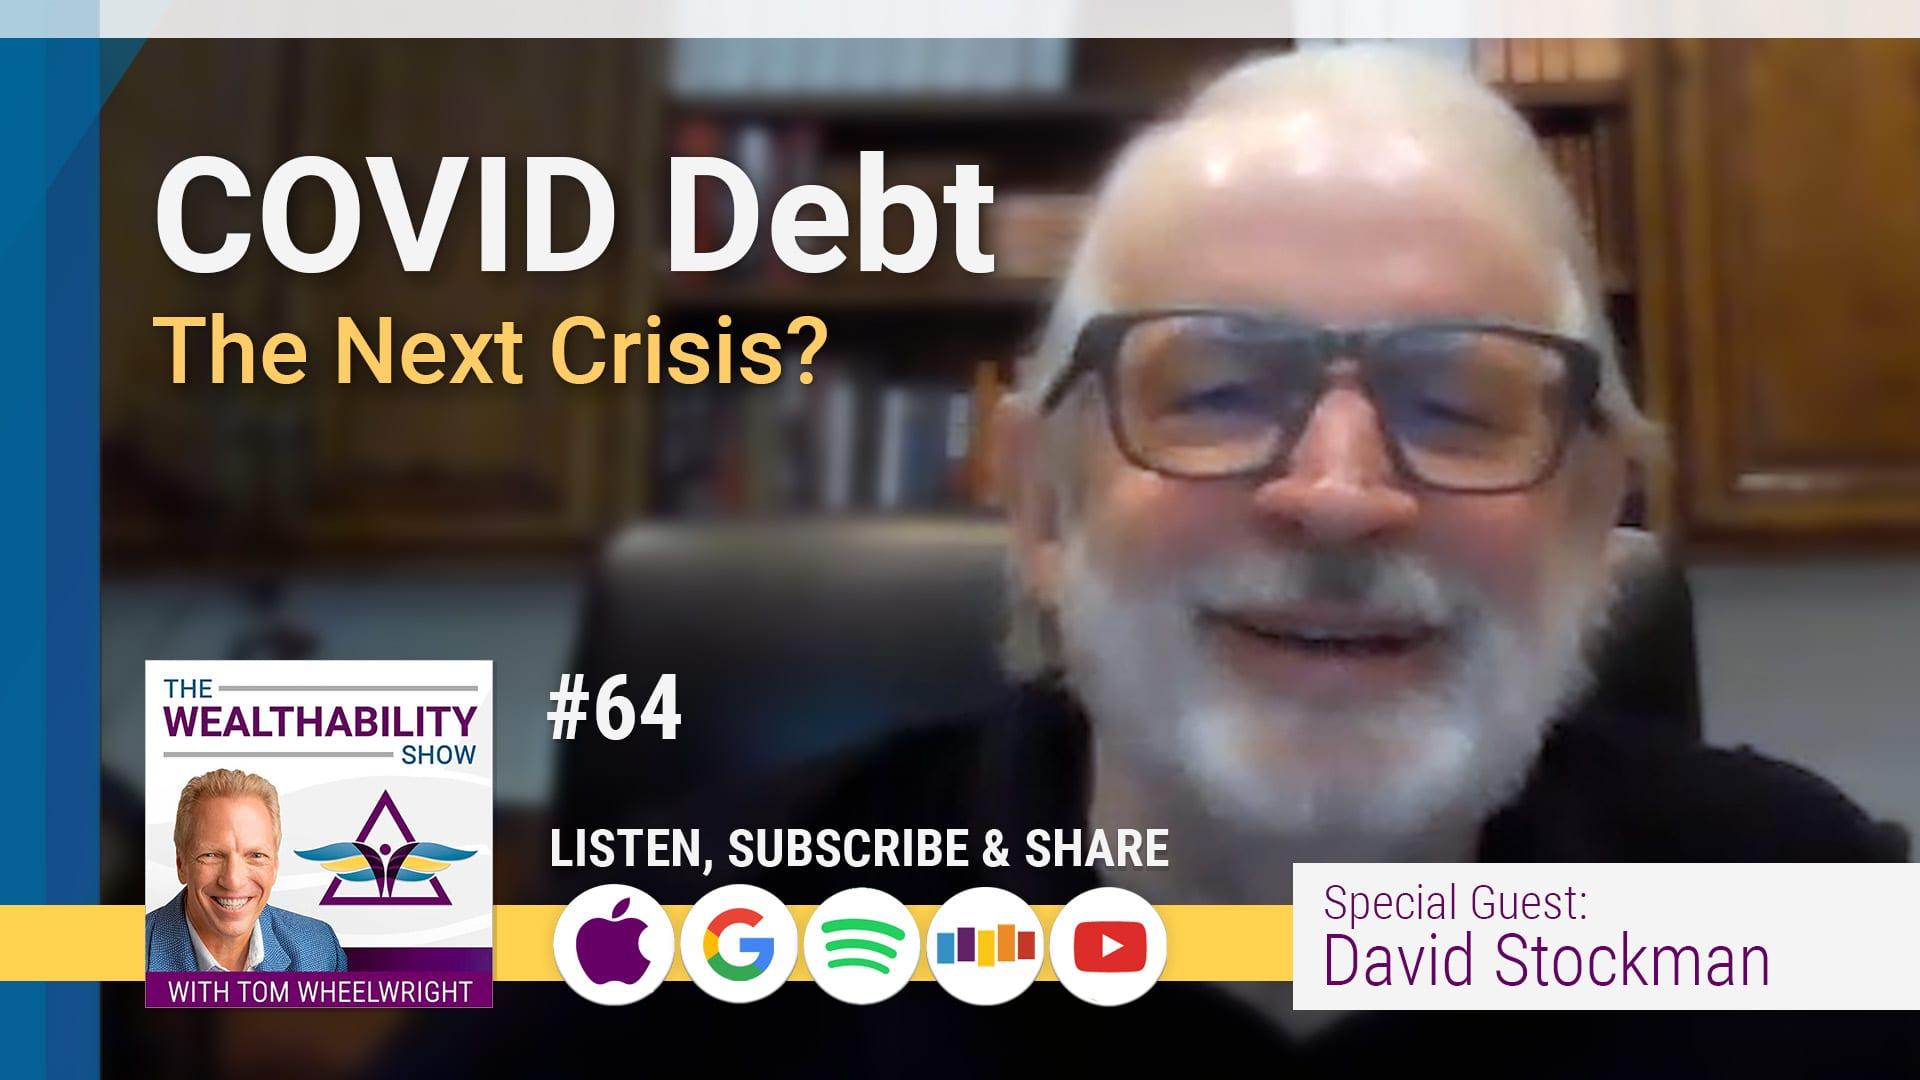 David Stockman - COVID Debt